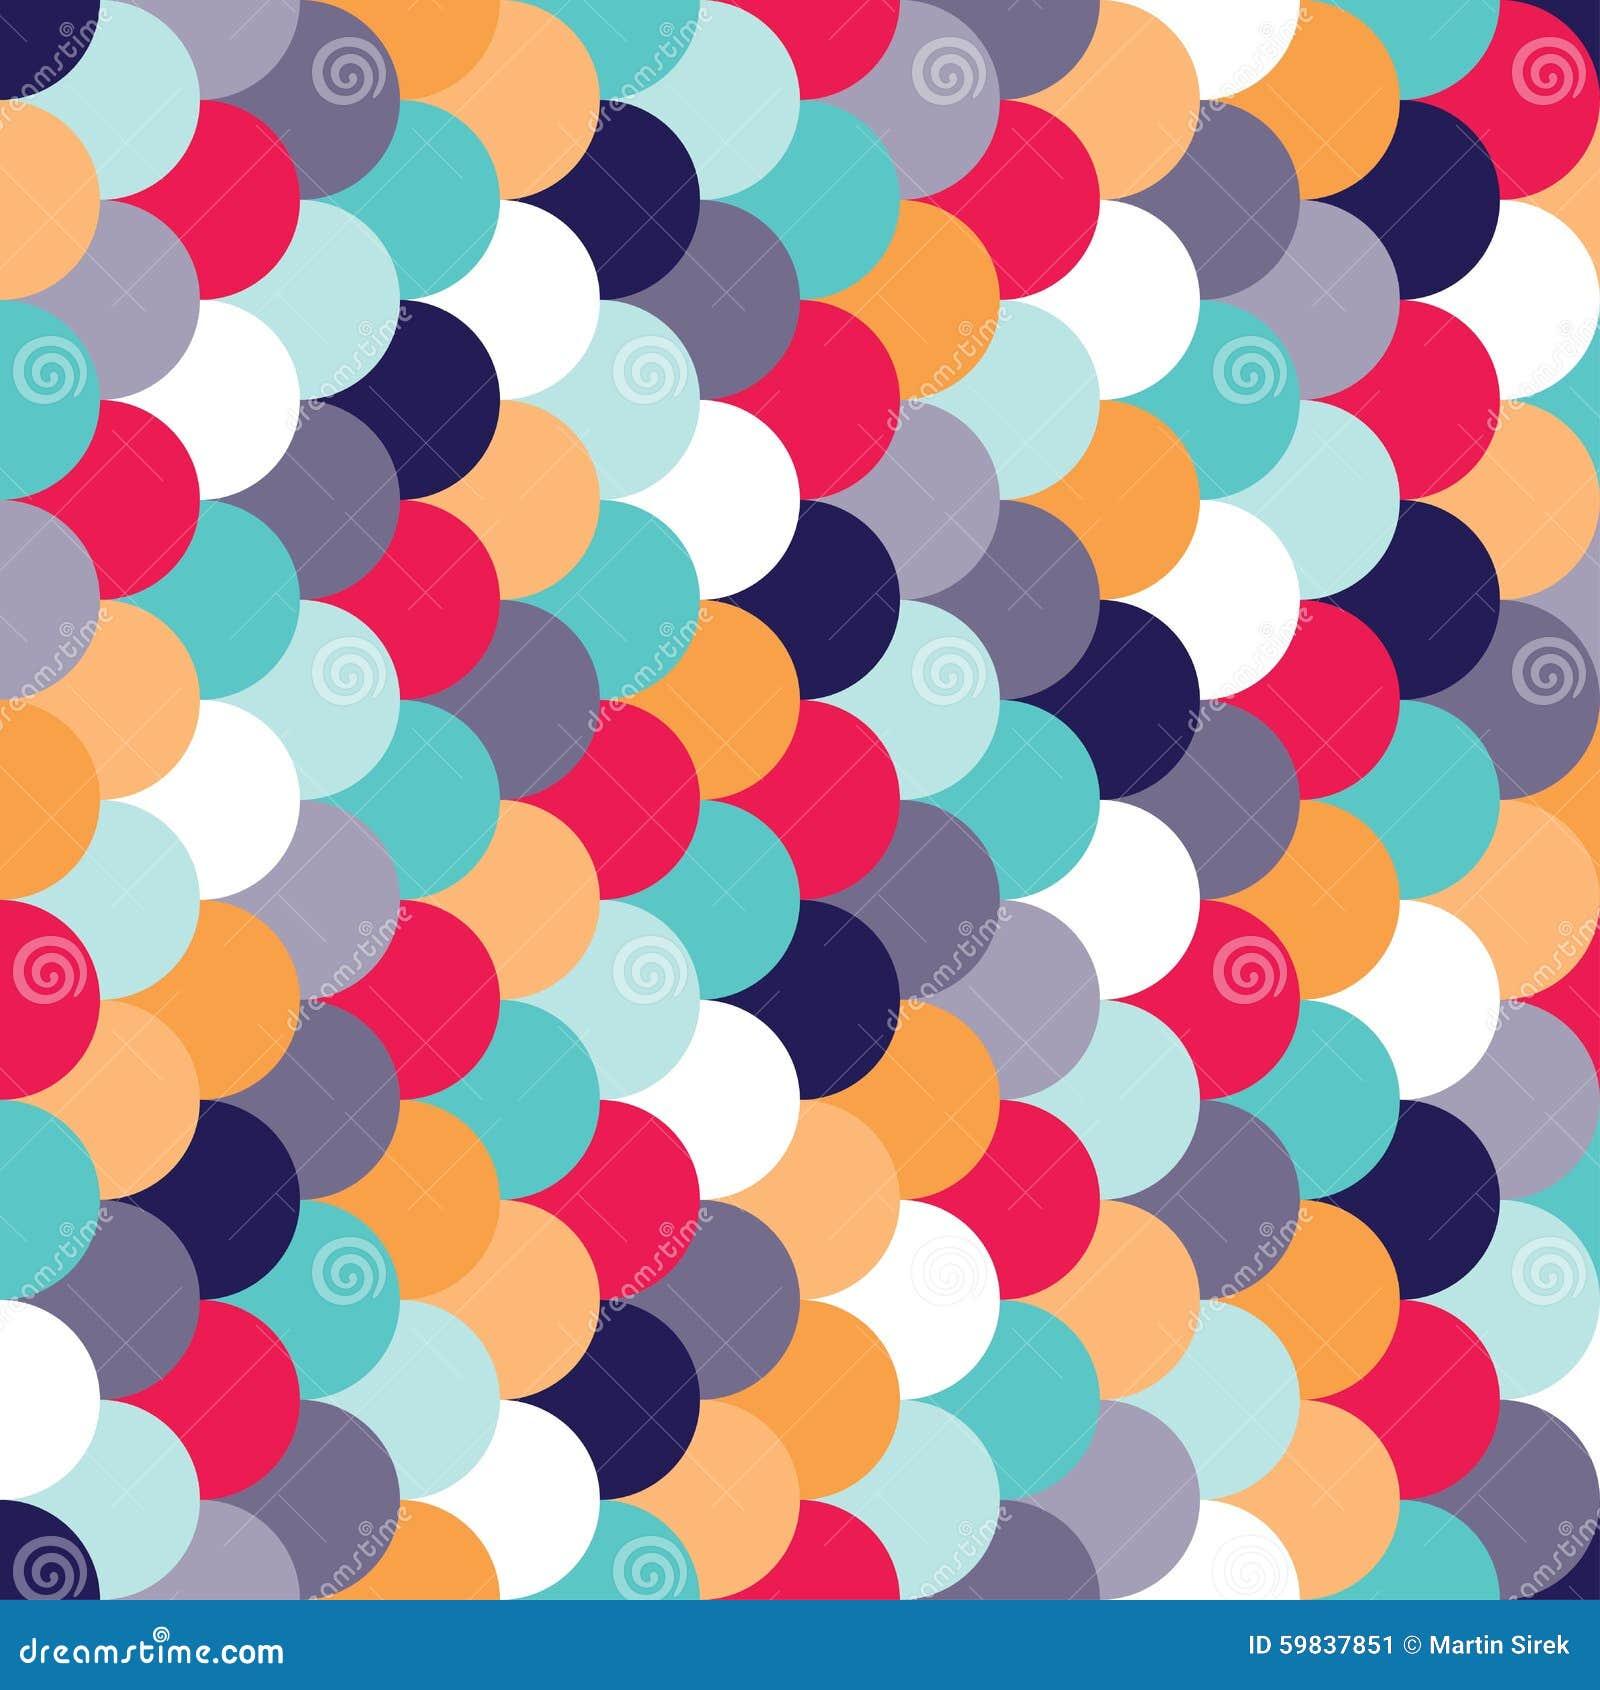 Geometric Prints And Patterns